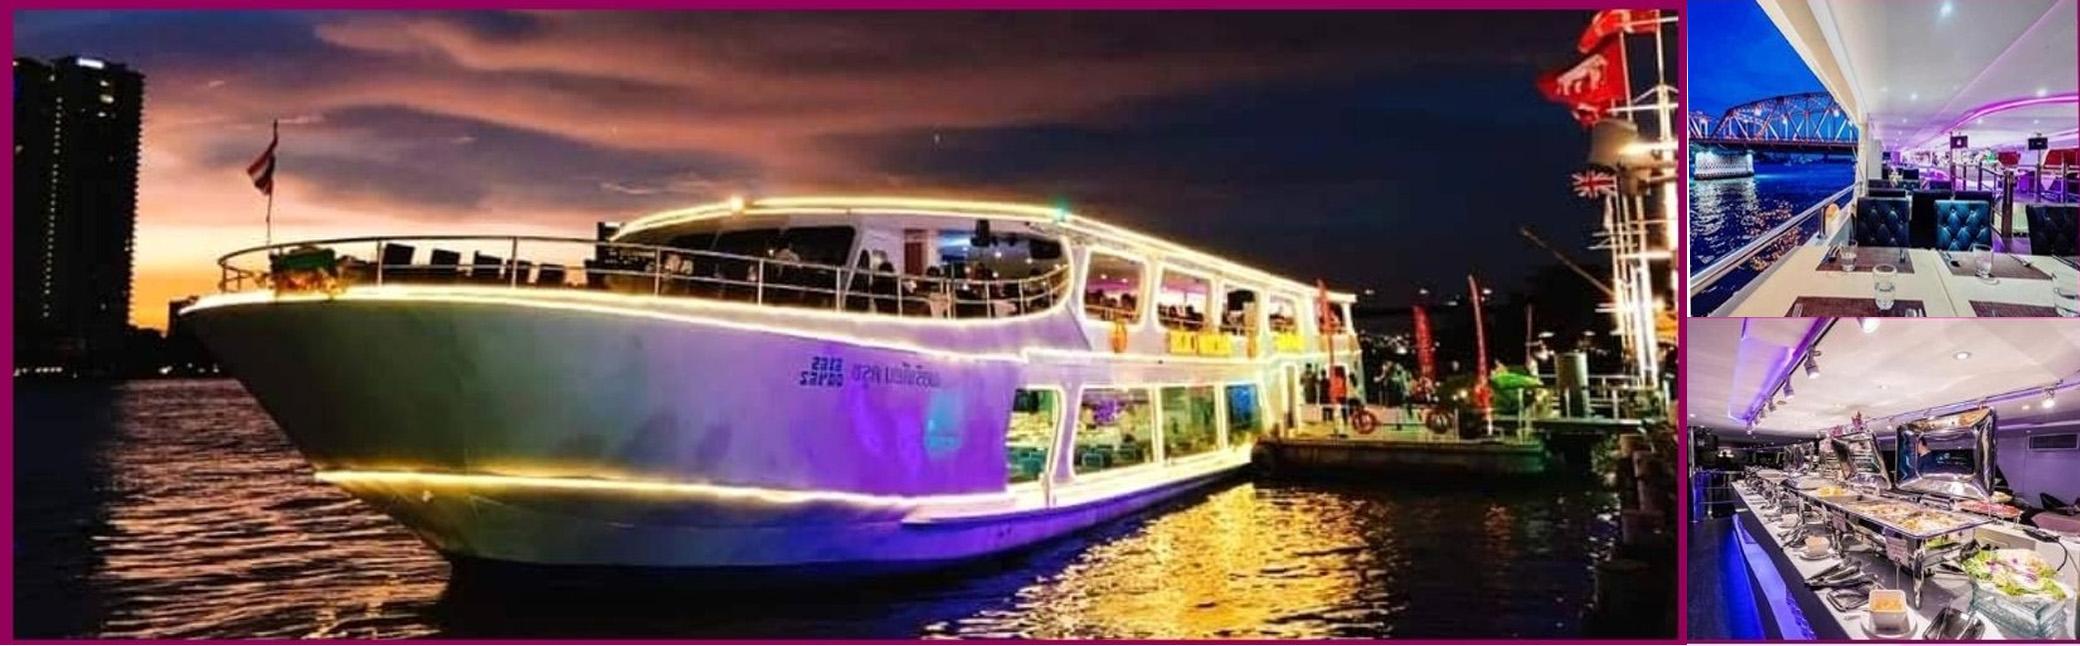 Meridian cruise Dinner ล่องเรือดินเนอร์แม่น้ำเจ้าพระยา  Buffet by เรือสำราญ